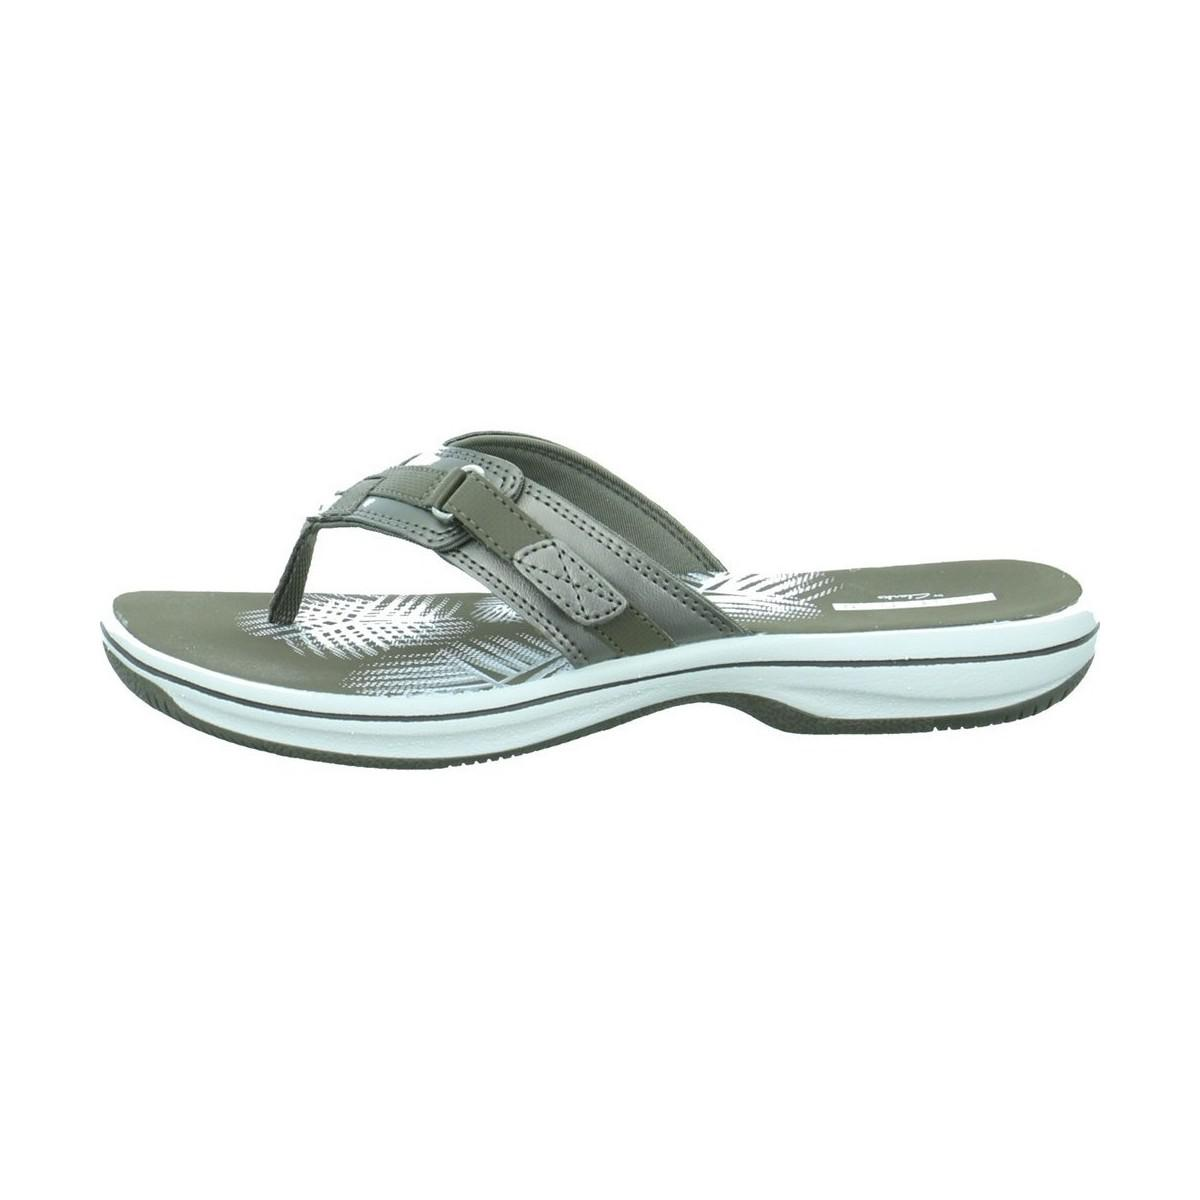 27ad4b3b94f9 Clarks Brinkley Sea Women s Sandals In Gold in Metallic - Lyst